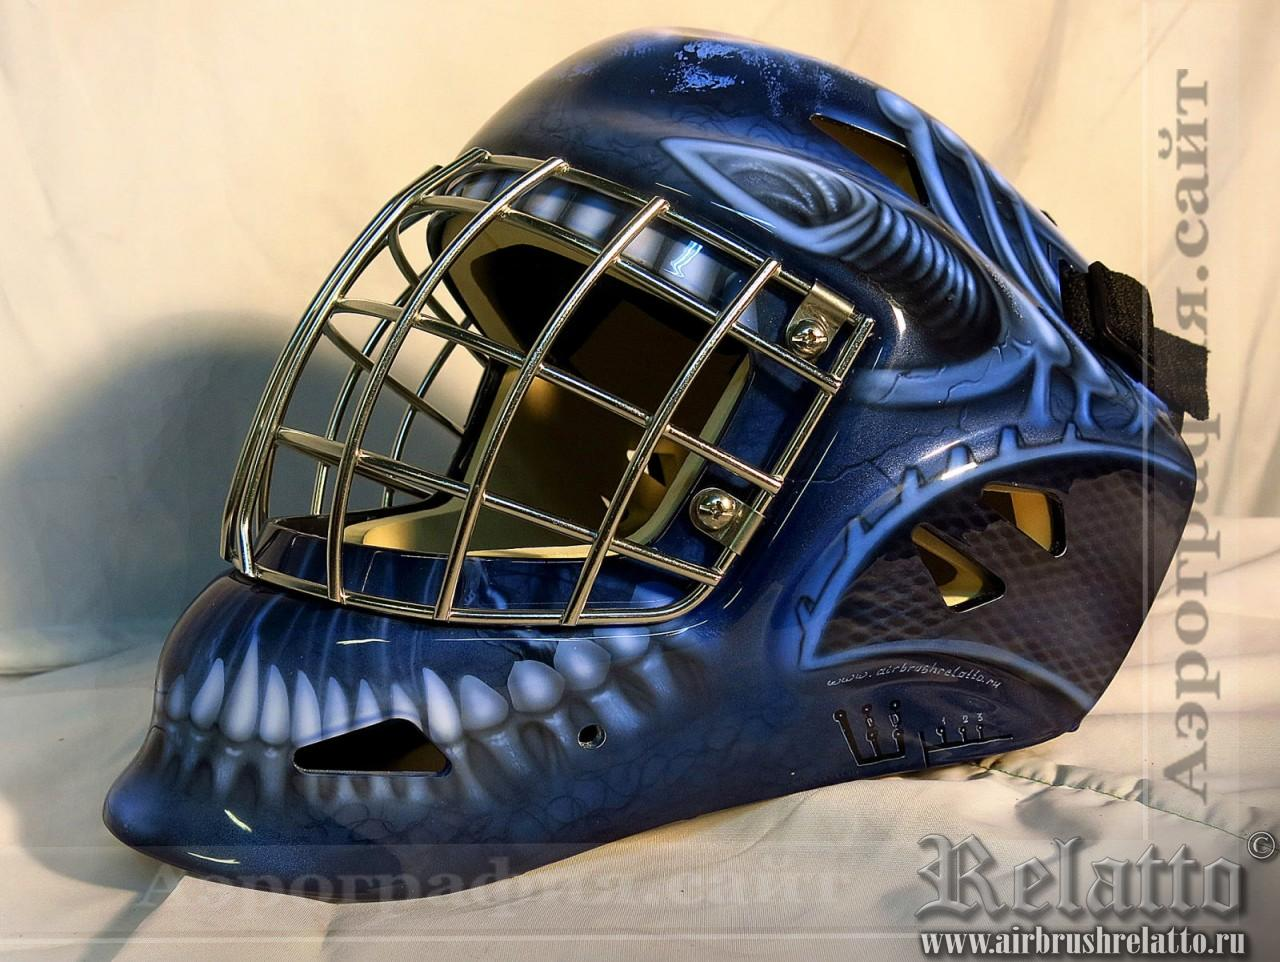 Аэрография вратарского хоккейного шлема